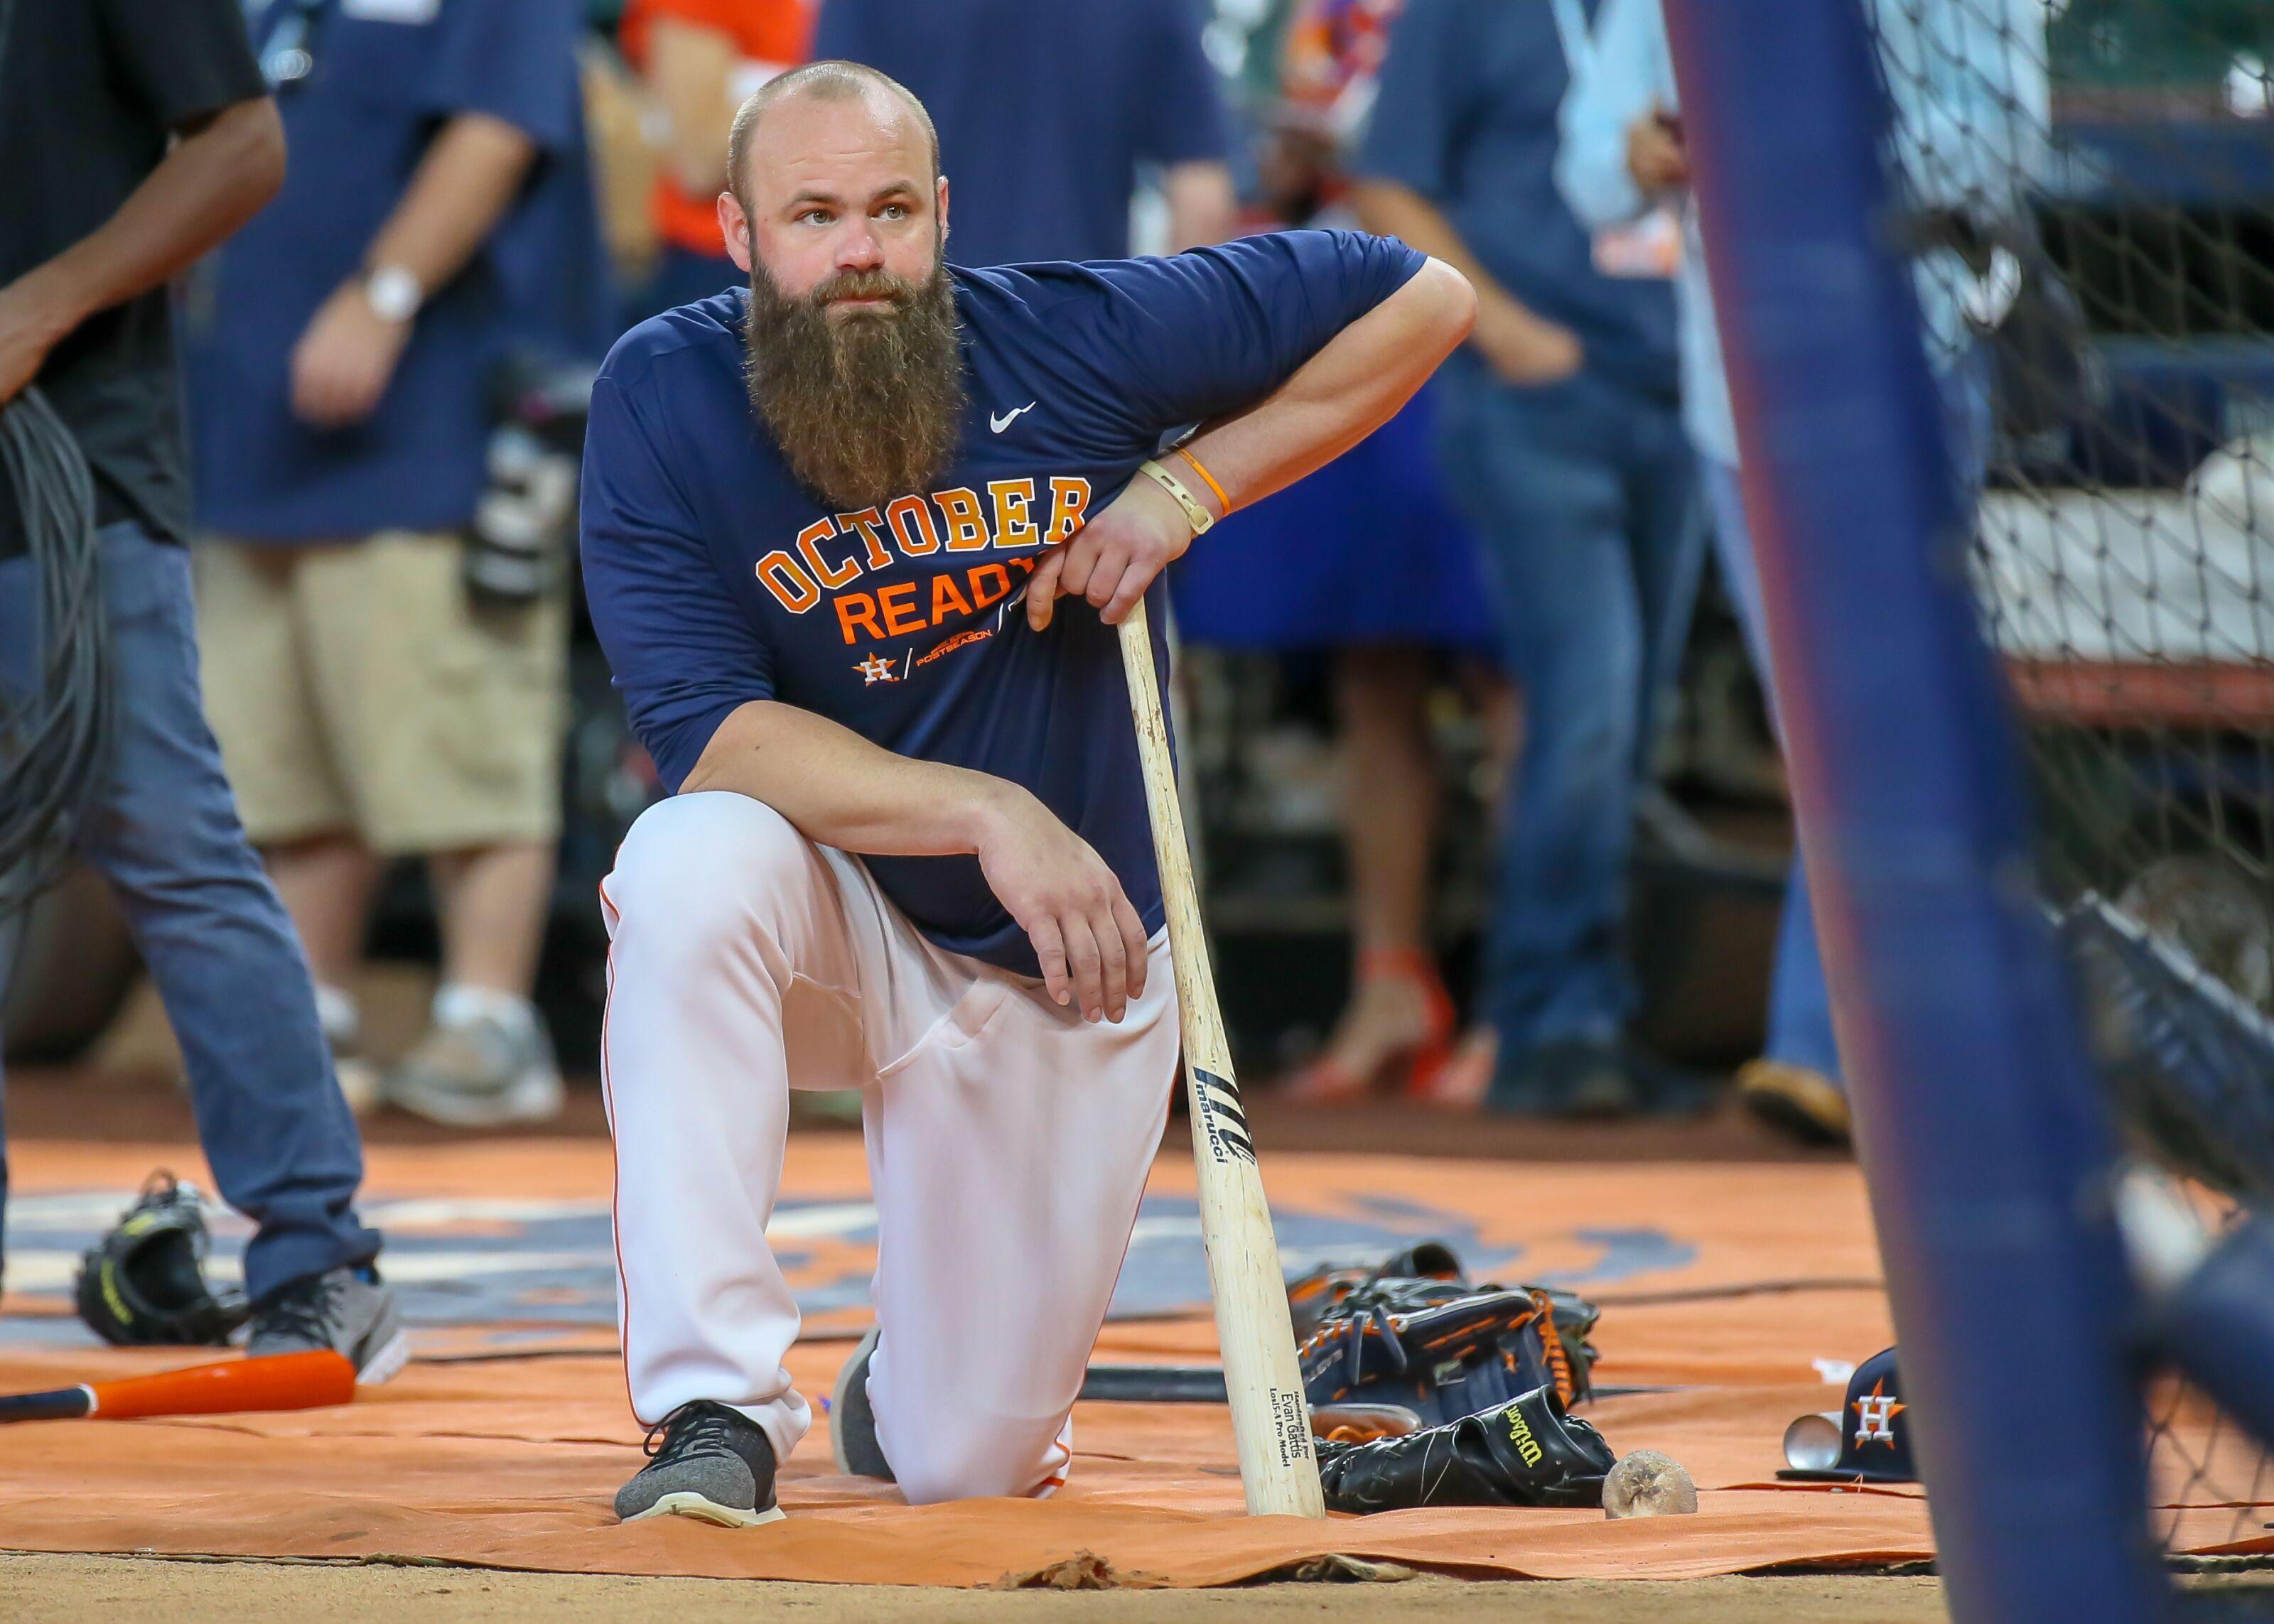 d9dc9b7f2 Houston Astros Rumors  Could an Evan Gattis return be on the horizon